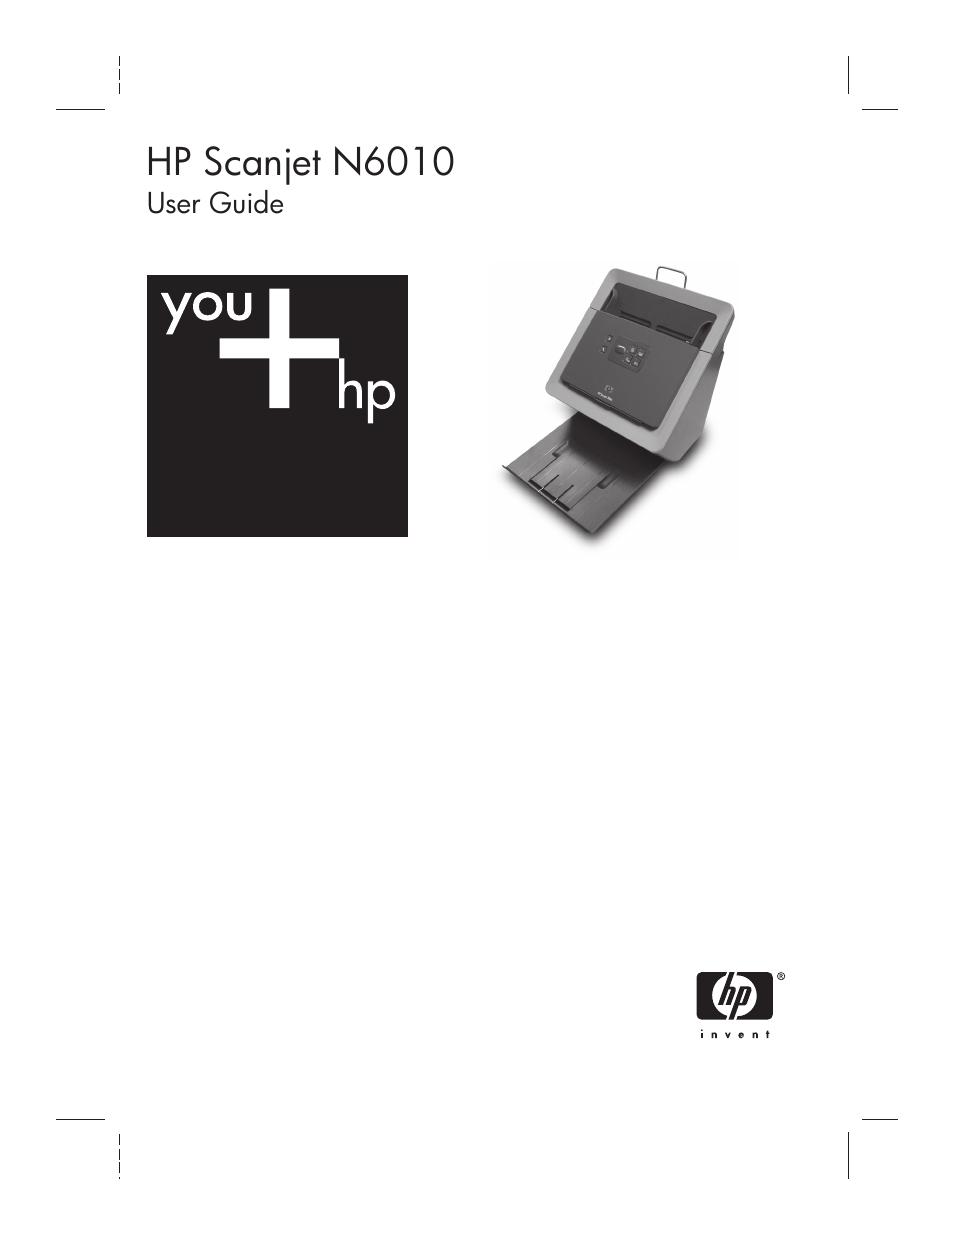 hp scanjet n6010 document sheet feed scanner user manual 32 pages rh manualsdir com HP Scanjet N8460 Sheet Fed Scanner HP